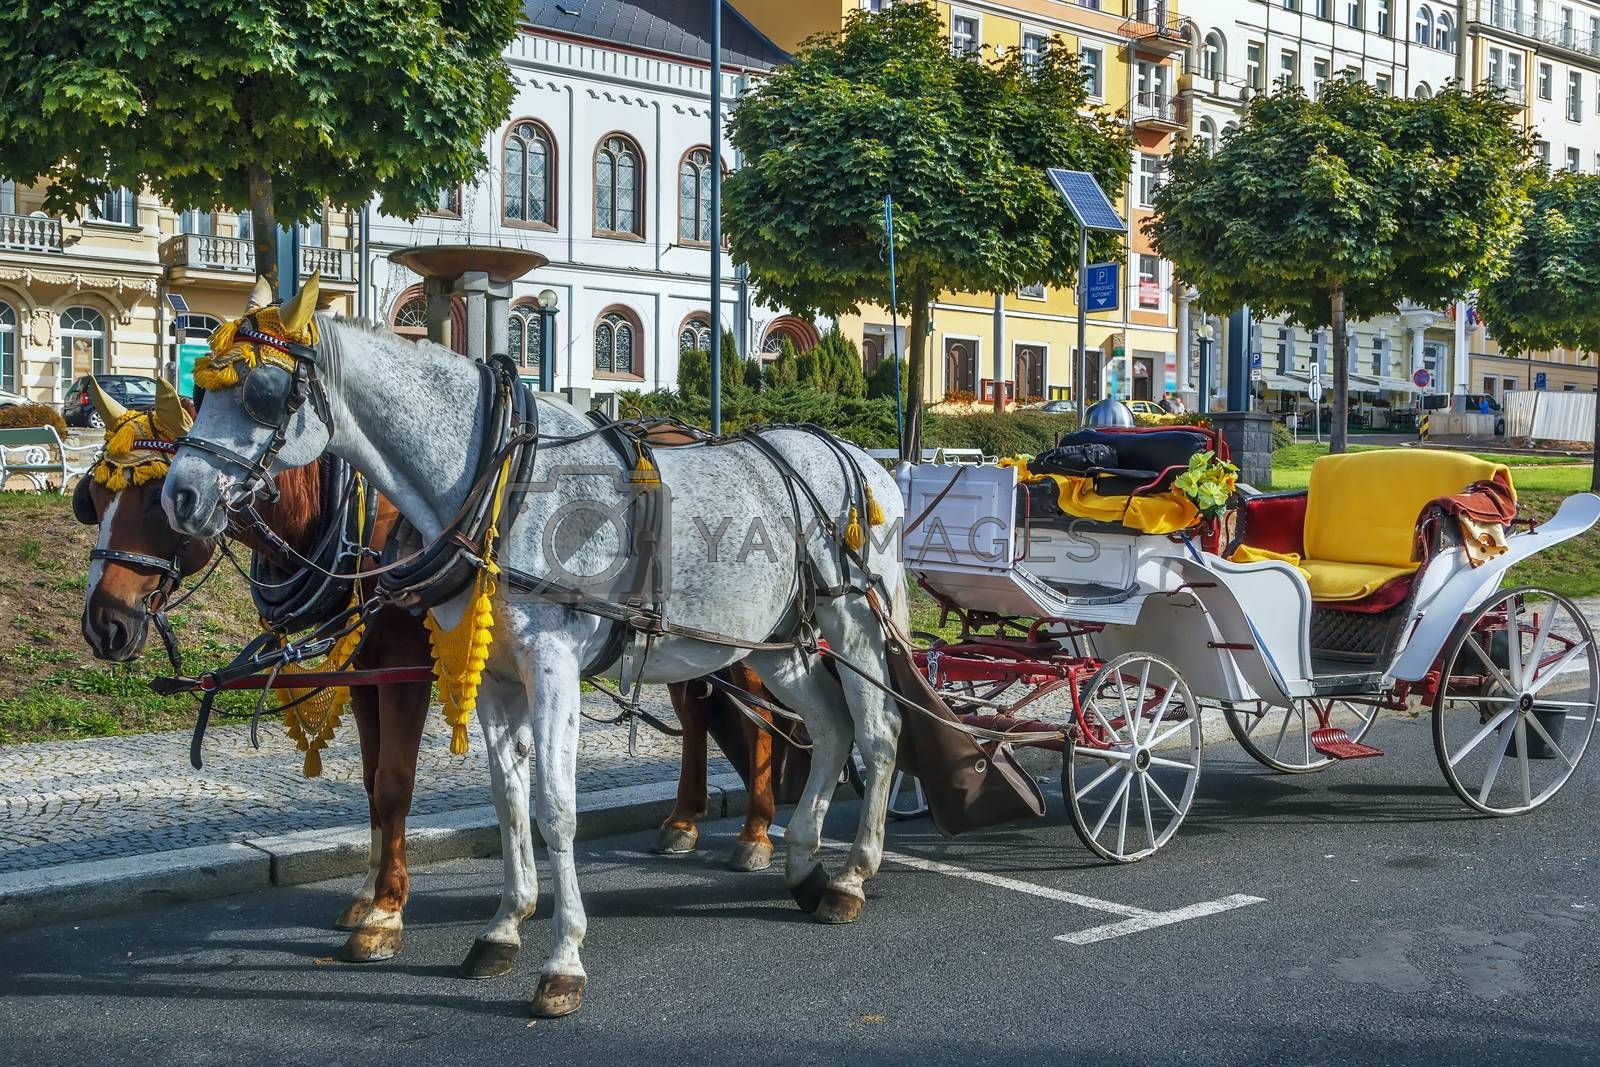 carriage in Marianske Lazne, Czech republic by borisb17